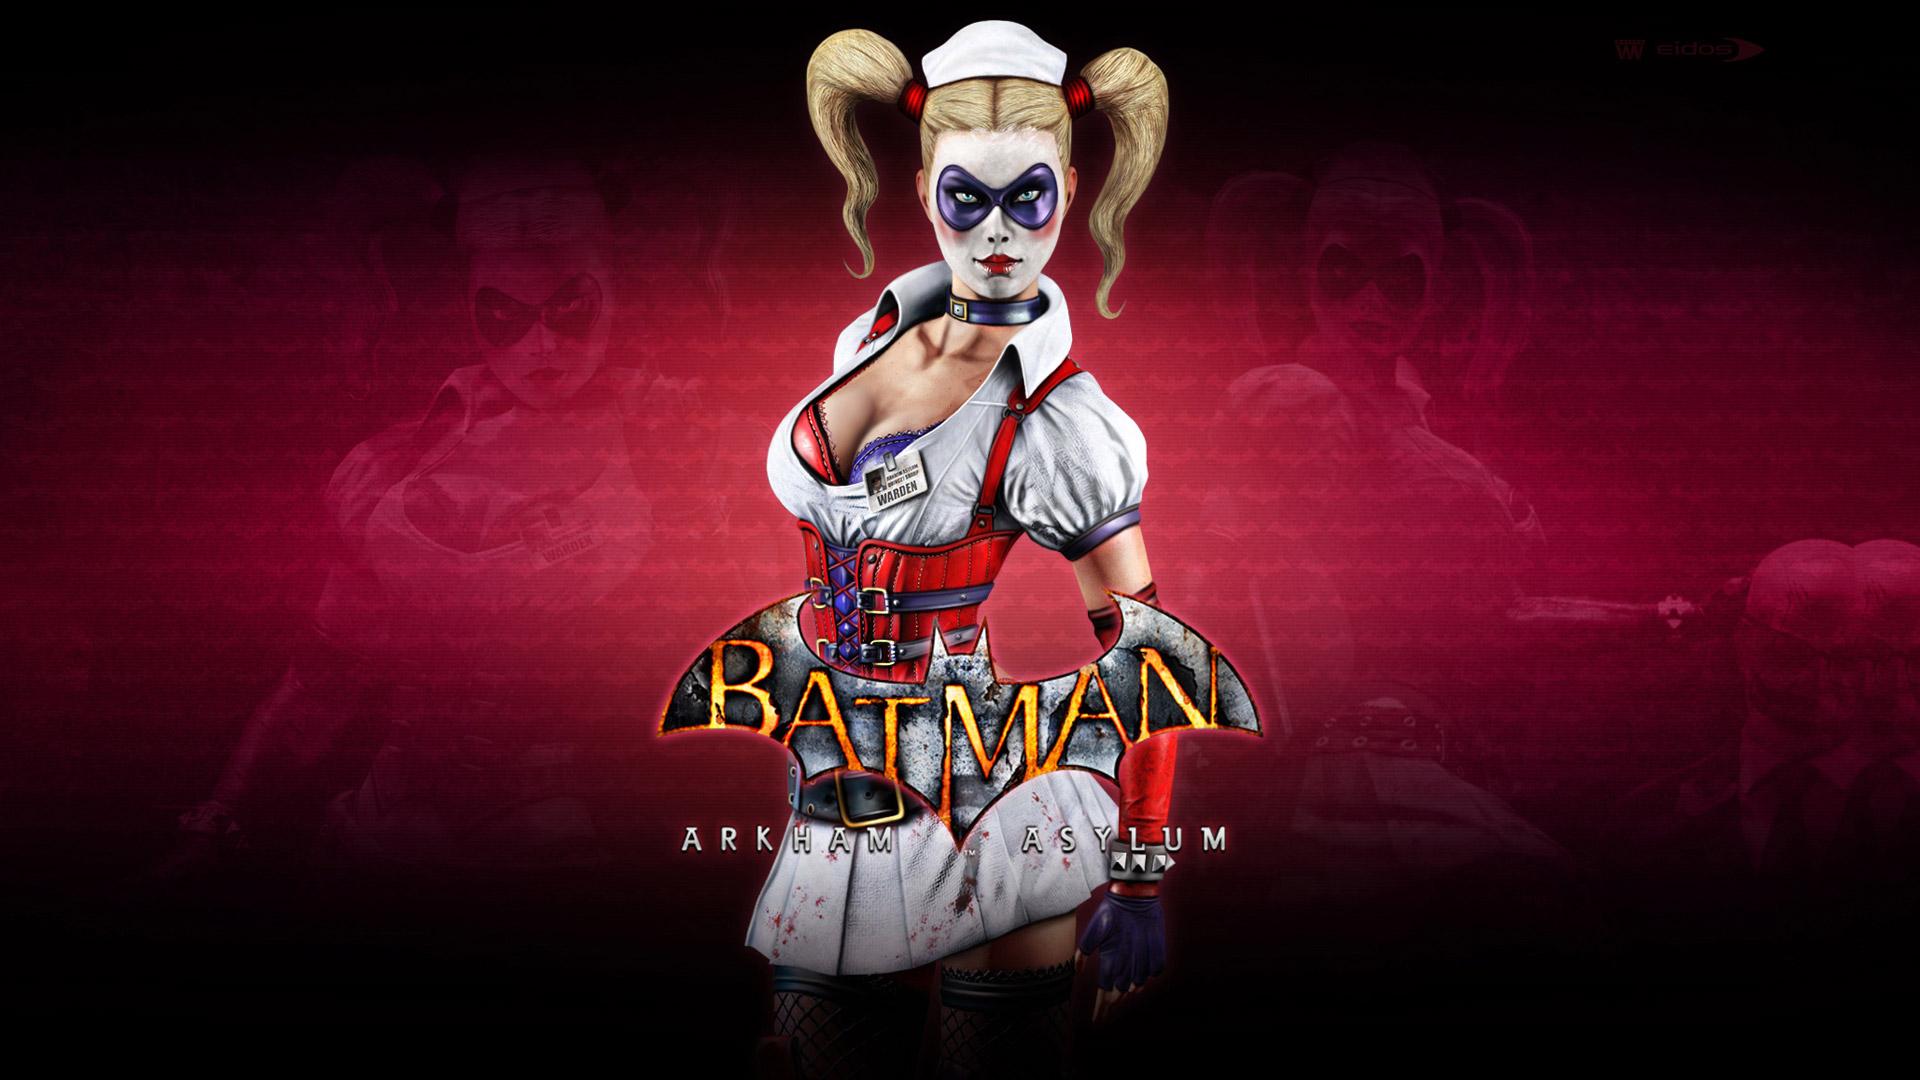 Batman: Arkham Asylum Wallpaper in 1920x1080